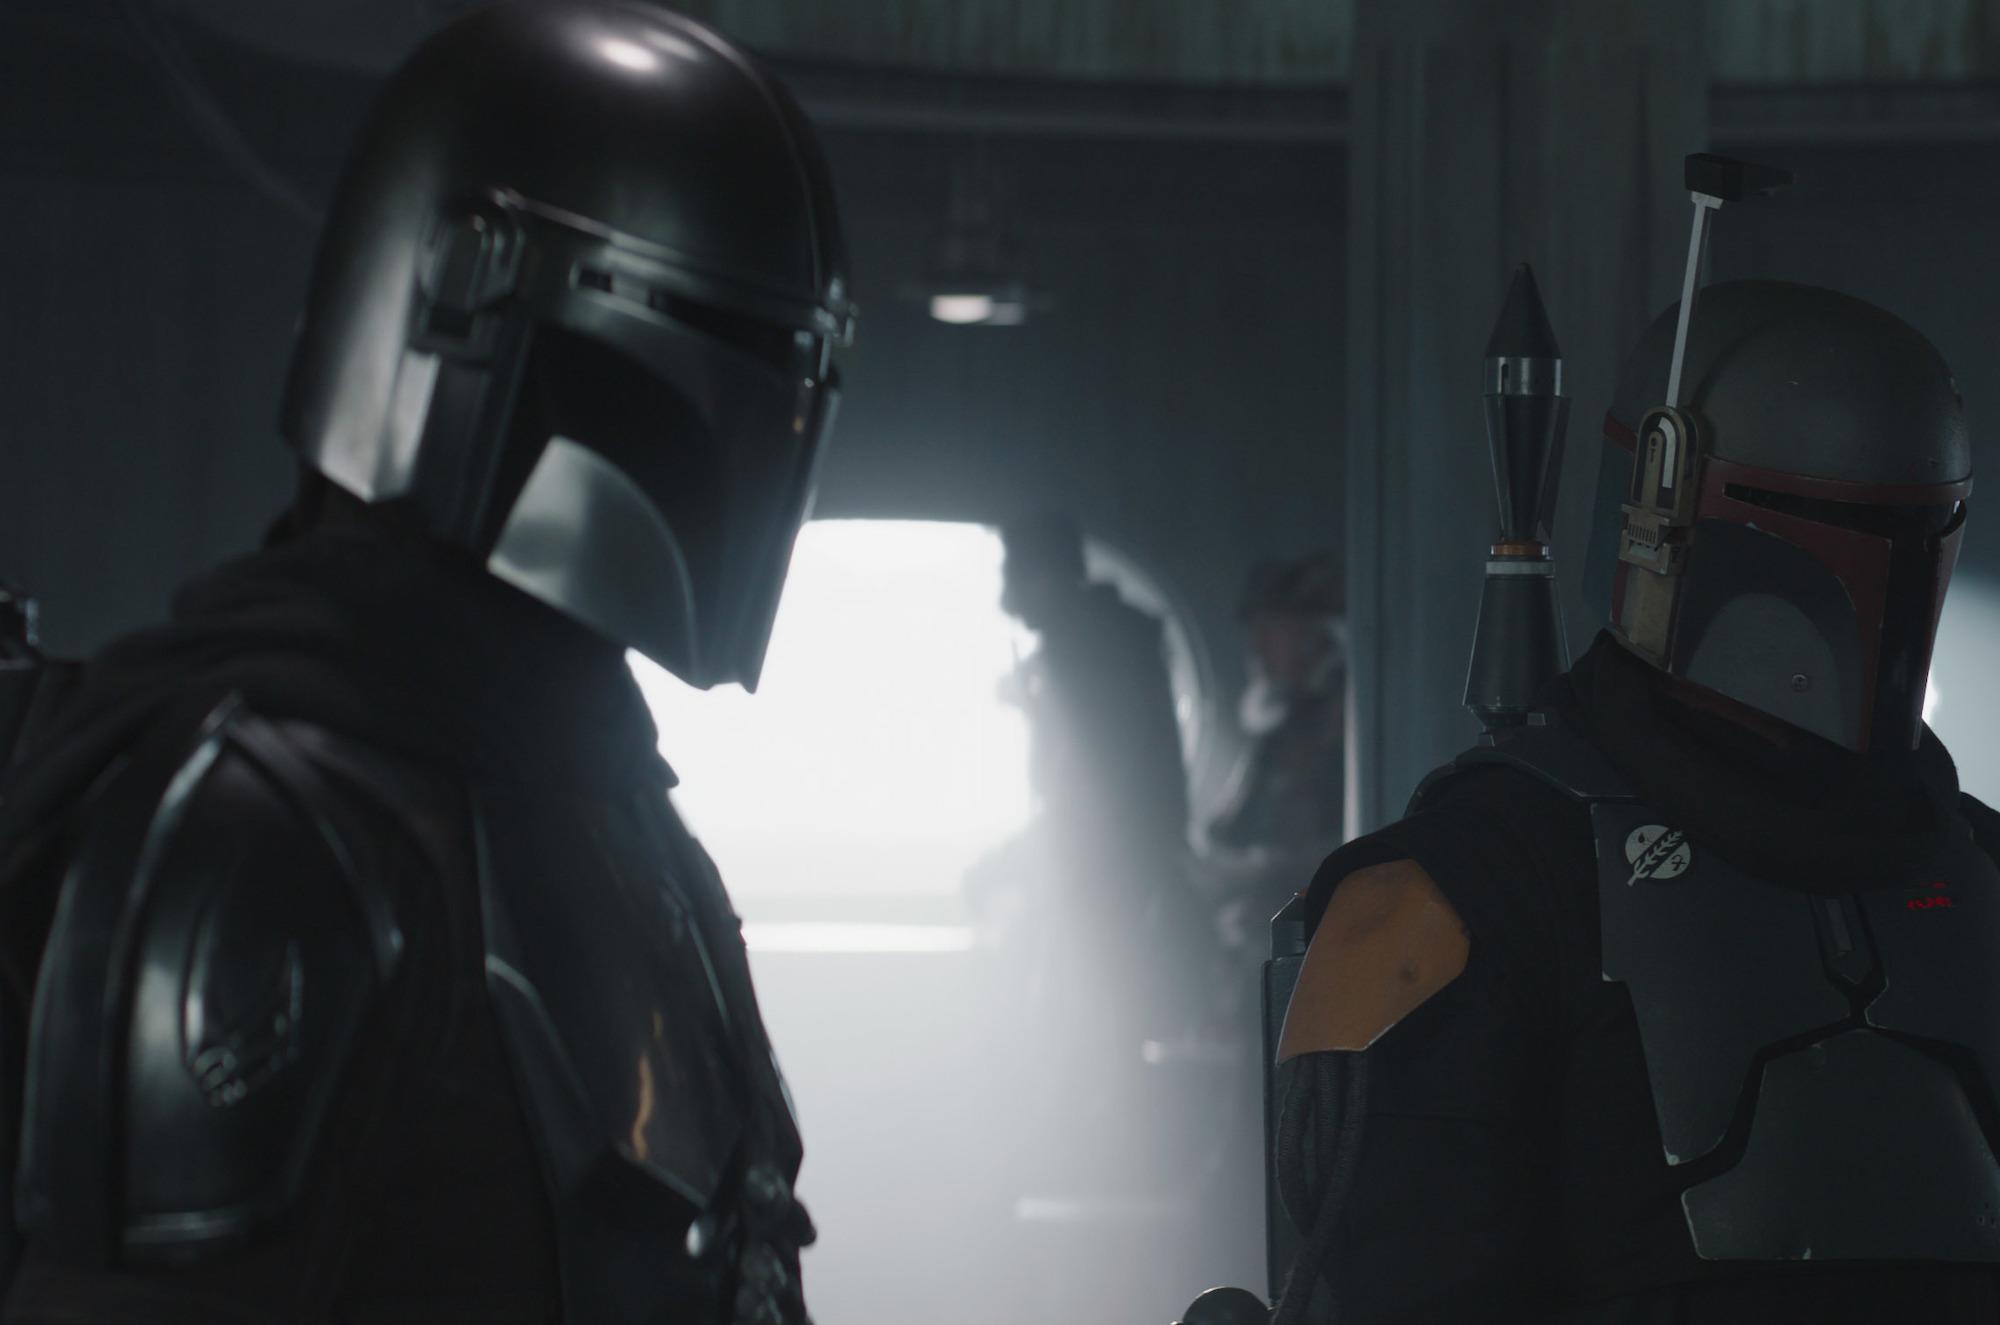 Mando and Boba Fett in season 2 of 'The Mandalorian'.